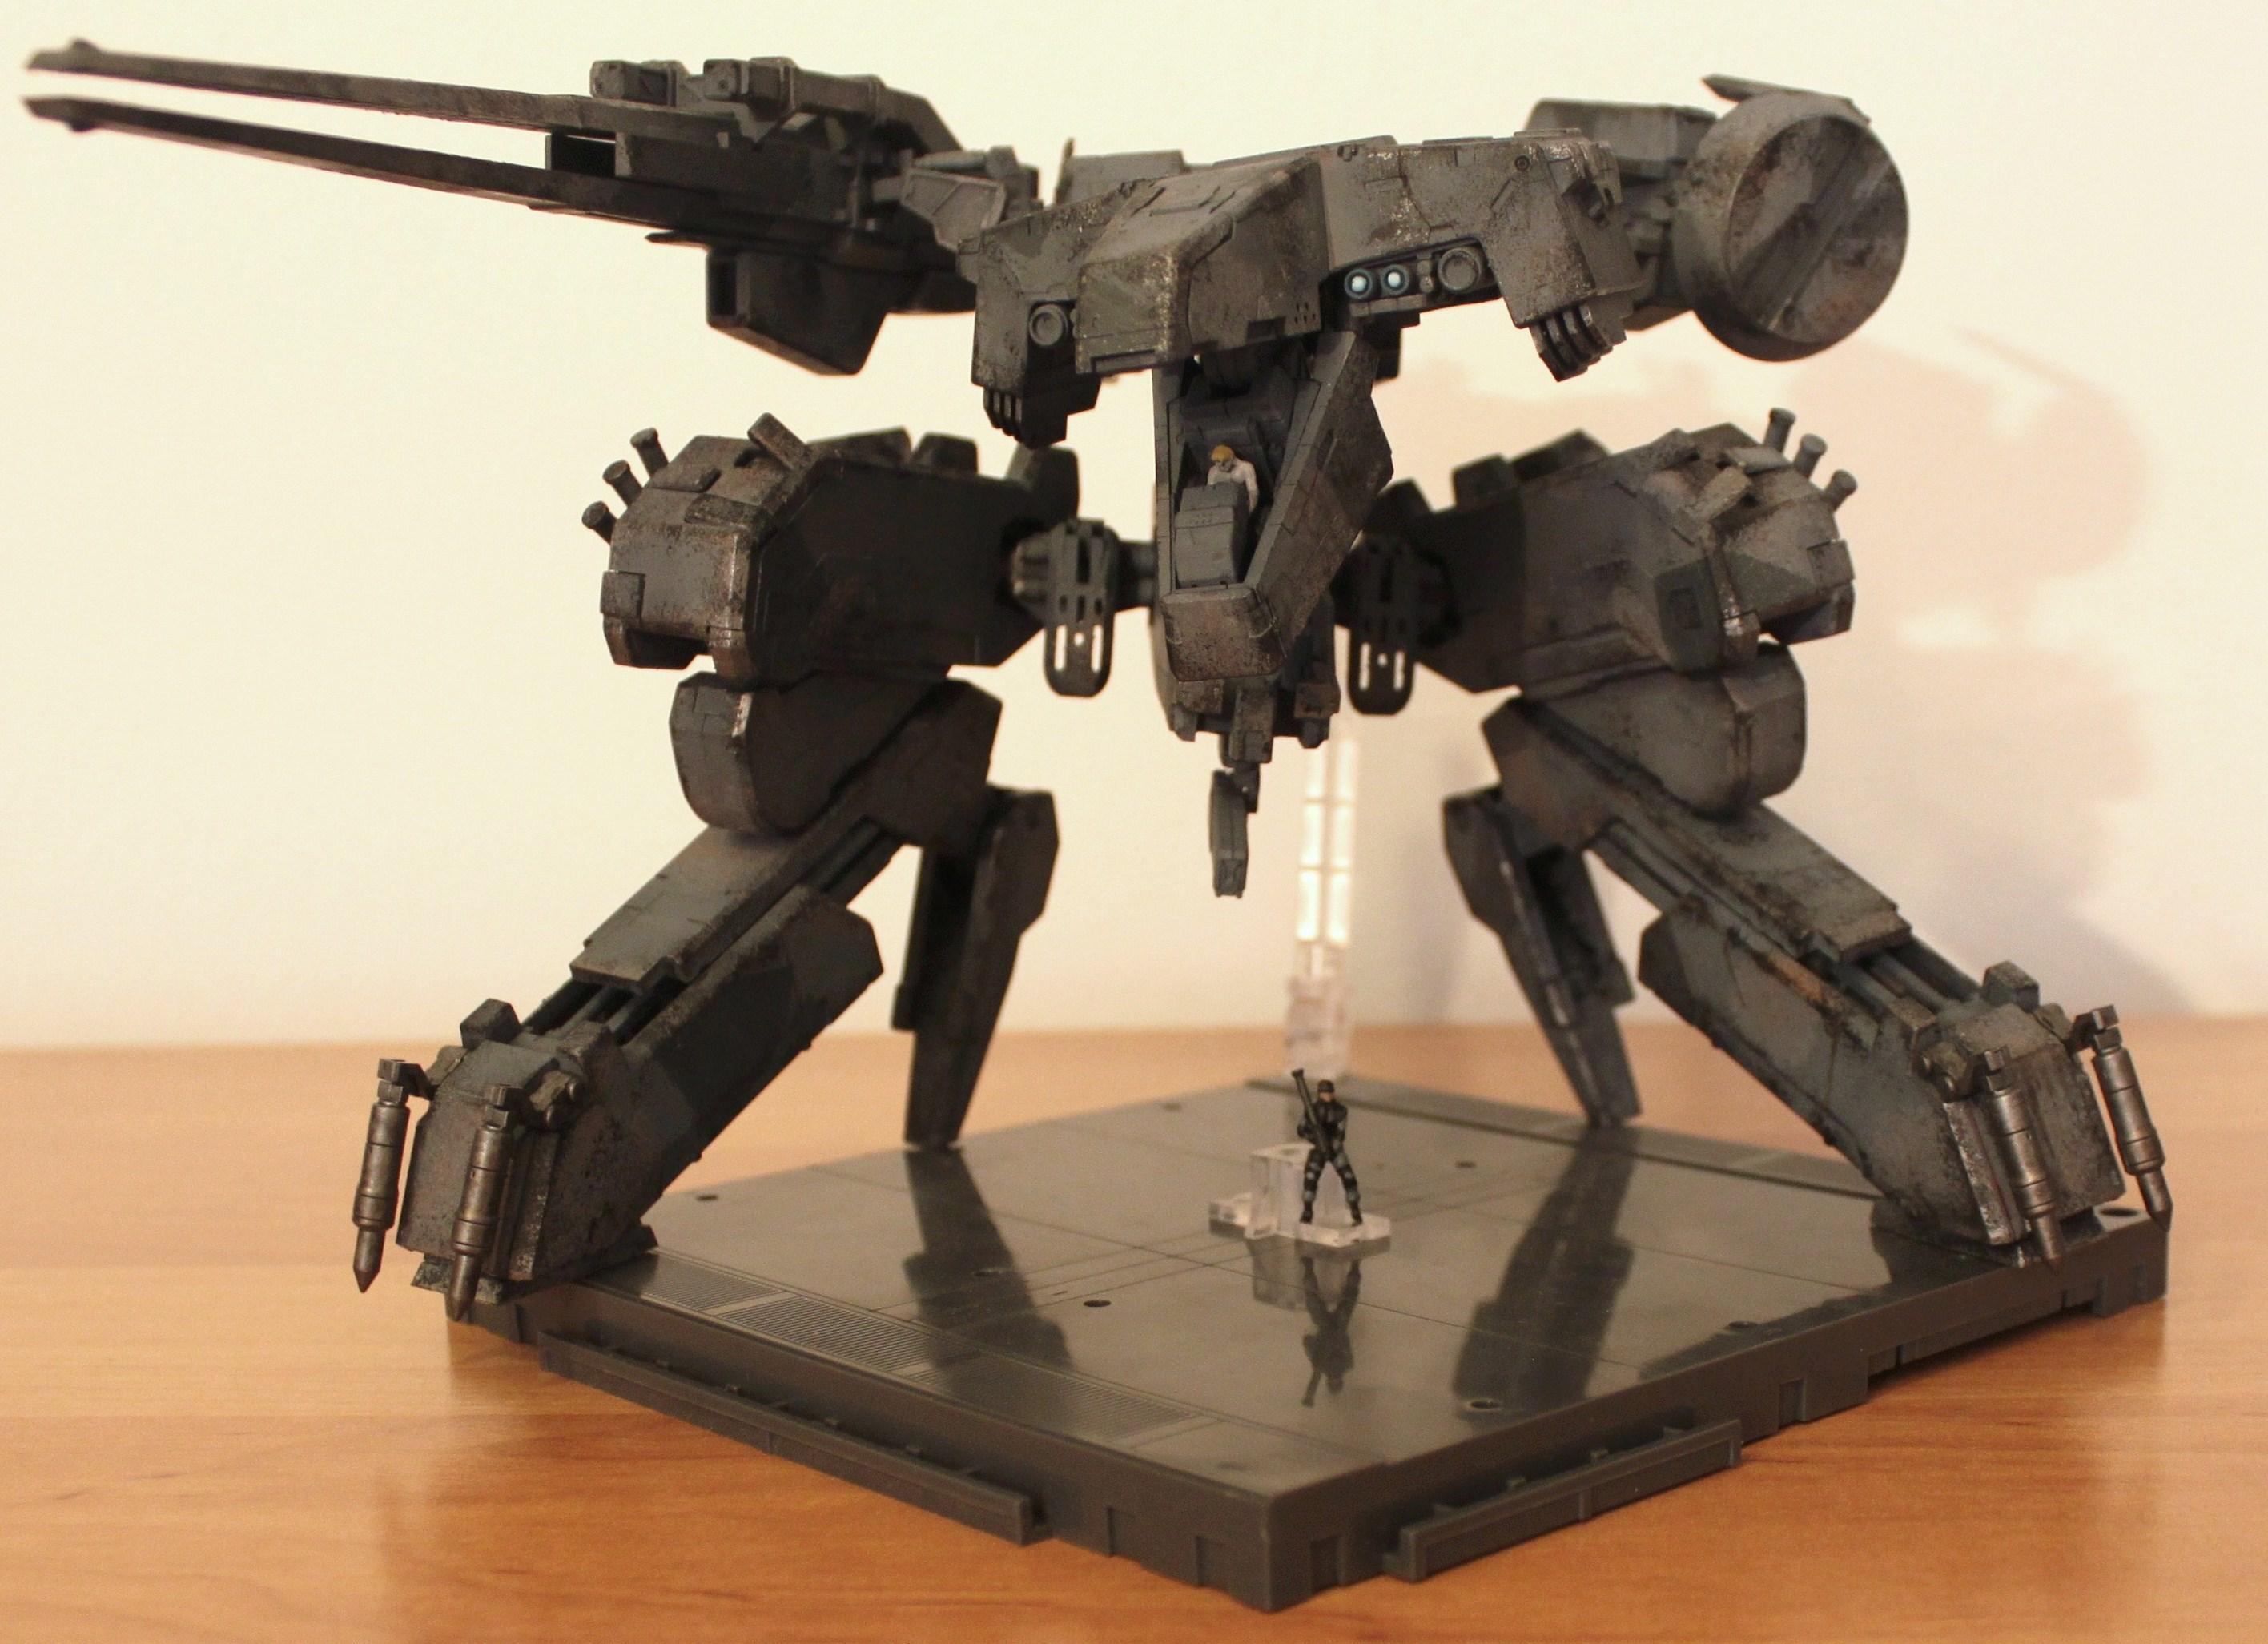 Metal Gear, Snake, Solid, Video Games